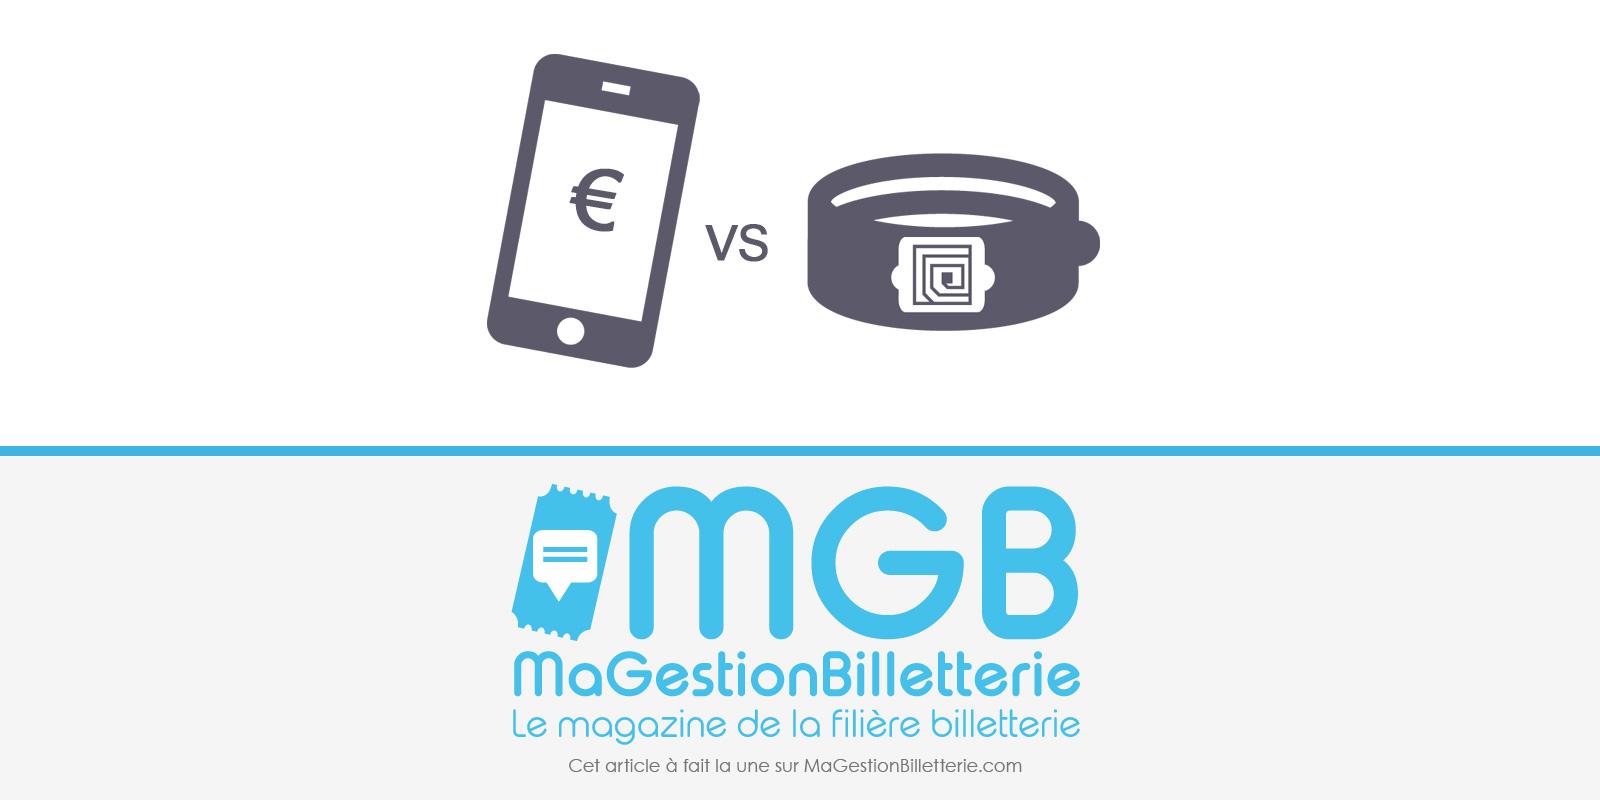 paiement-mobile-vs-cashless